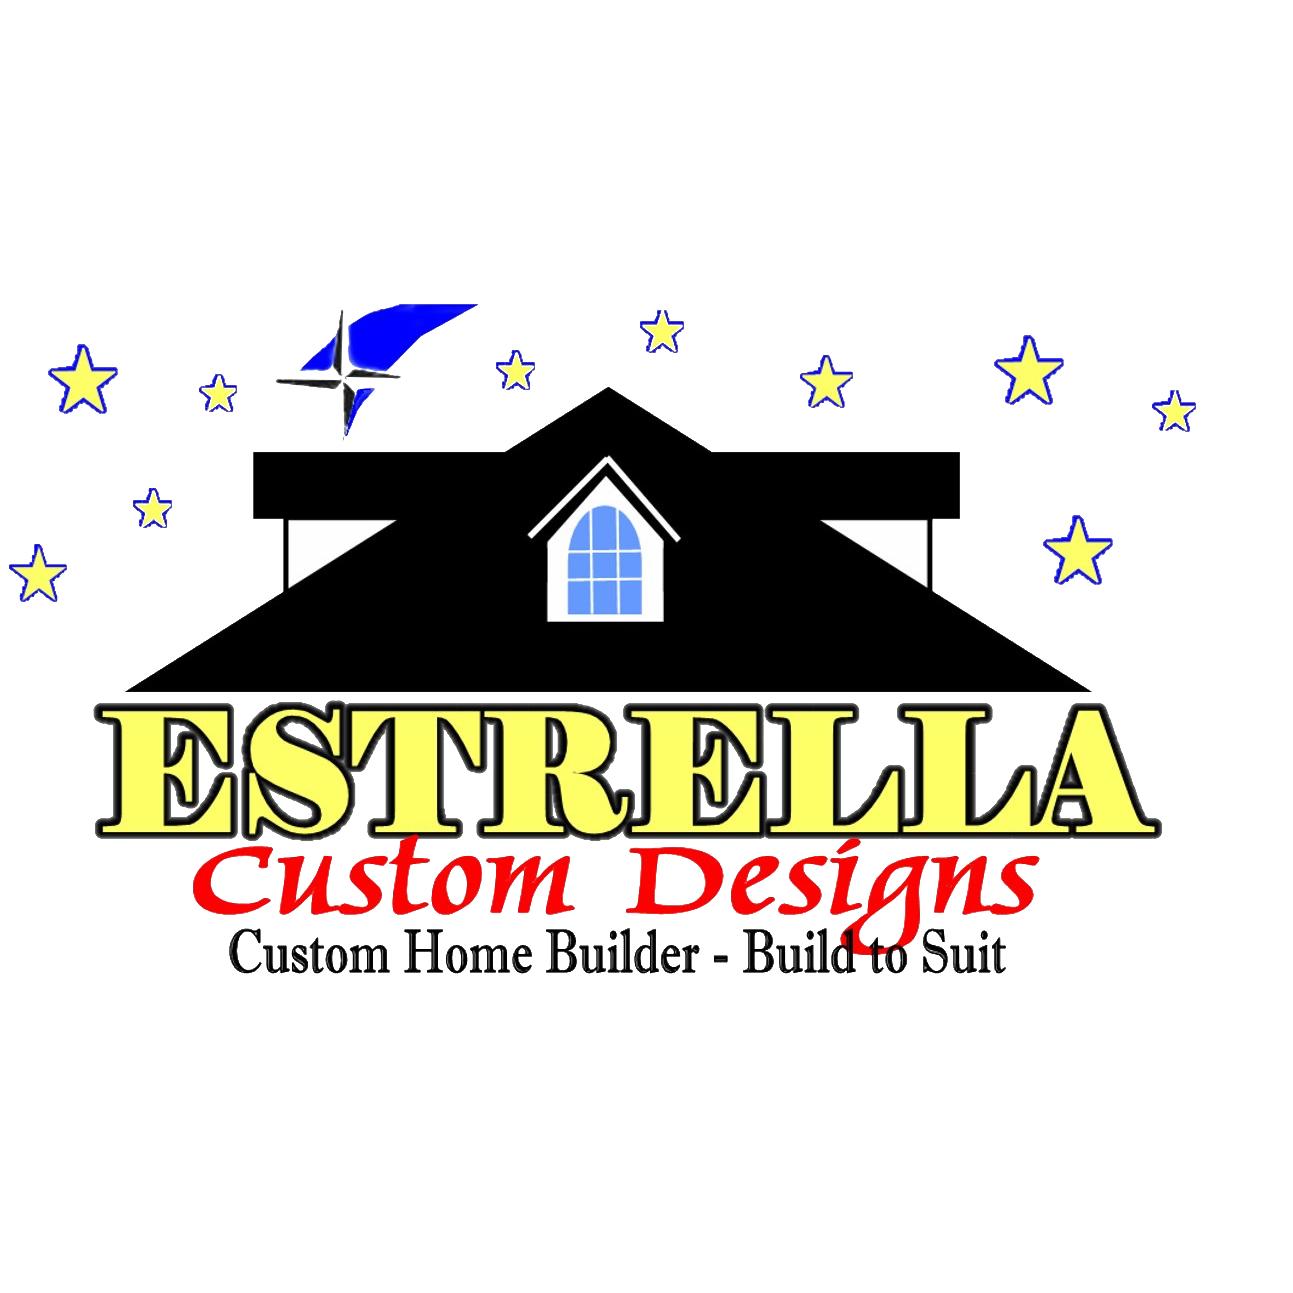 Estrella Custom Designs